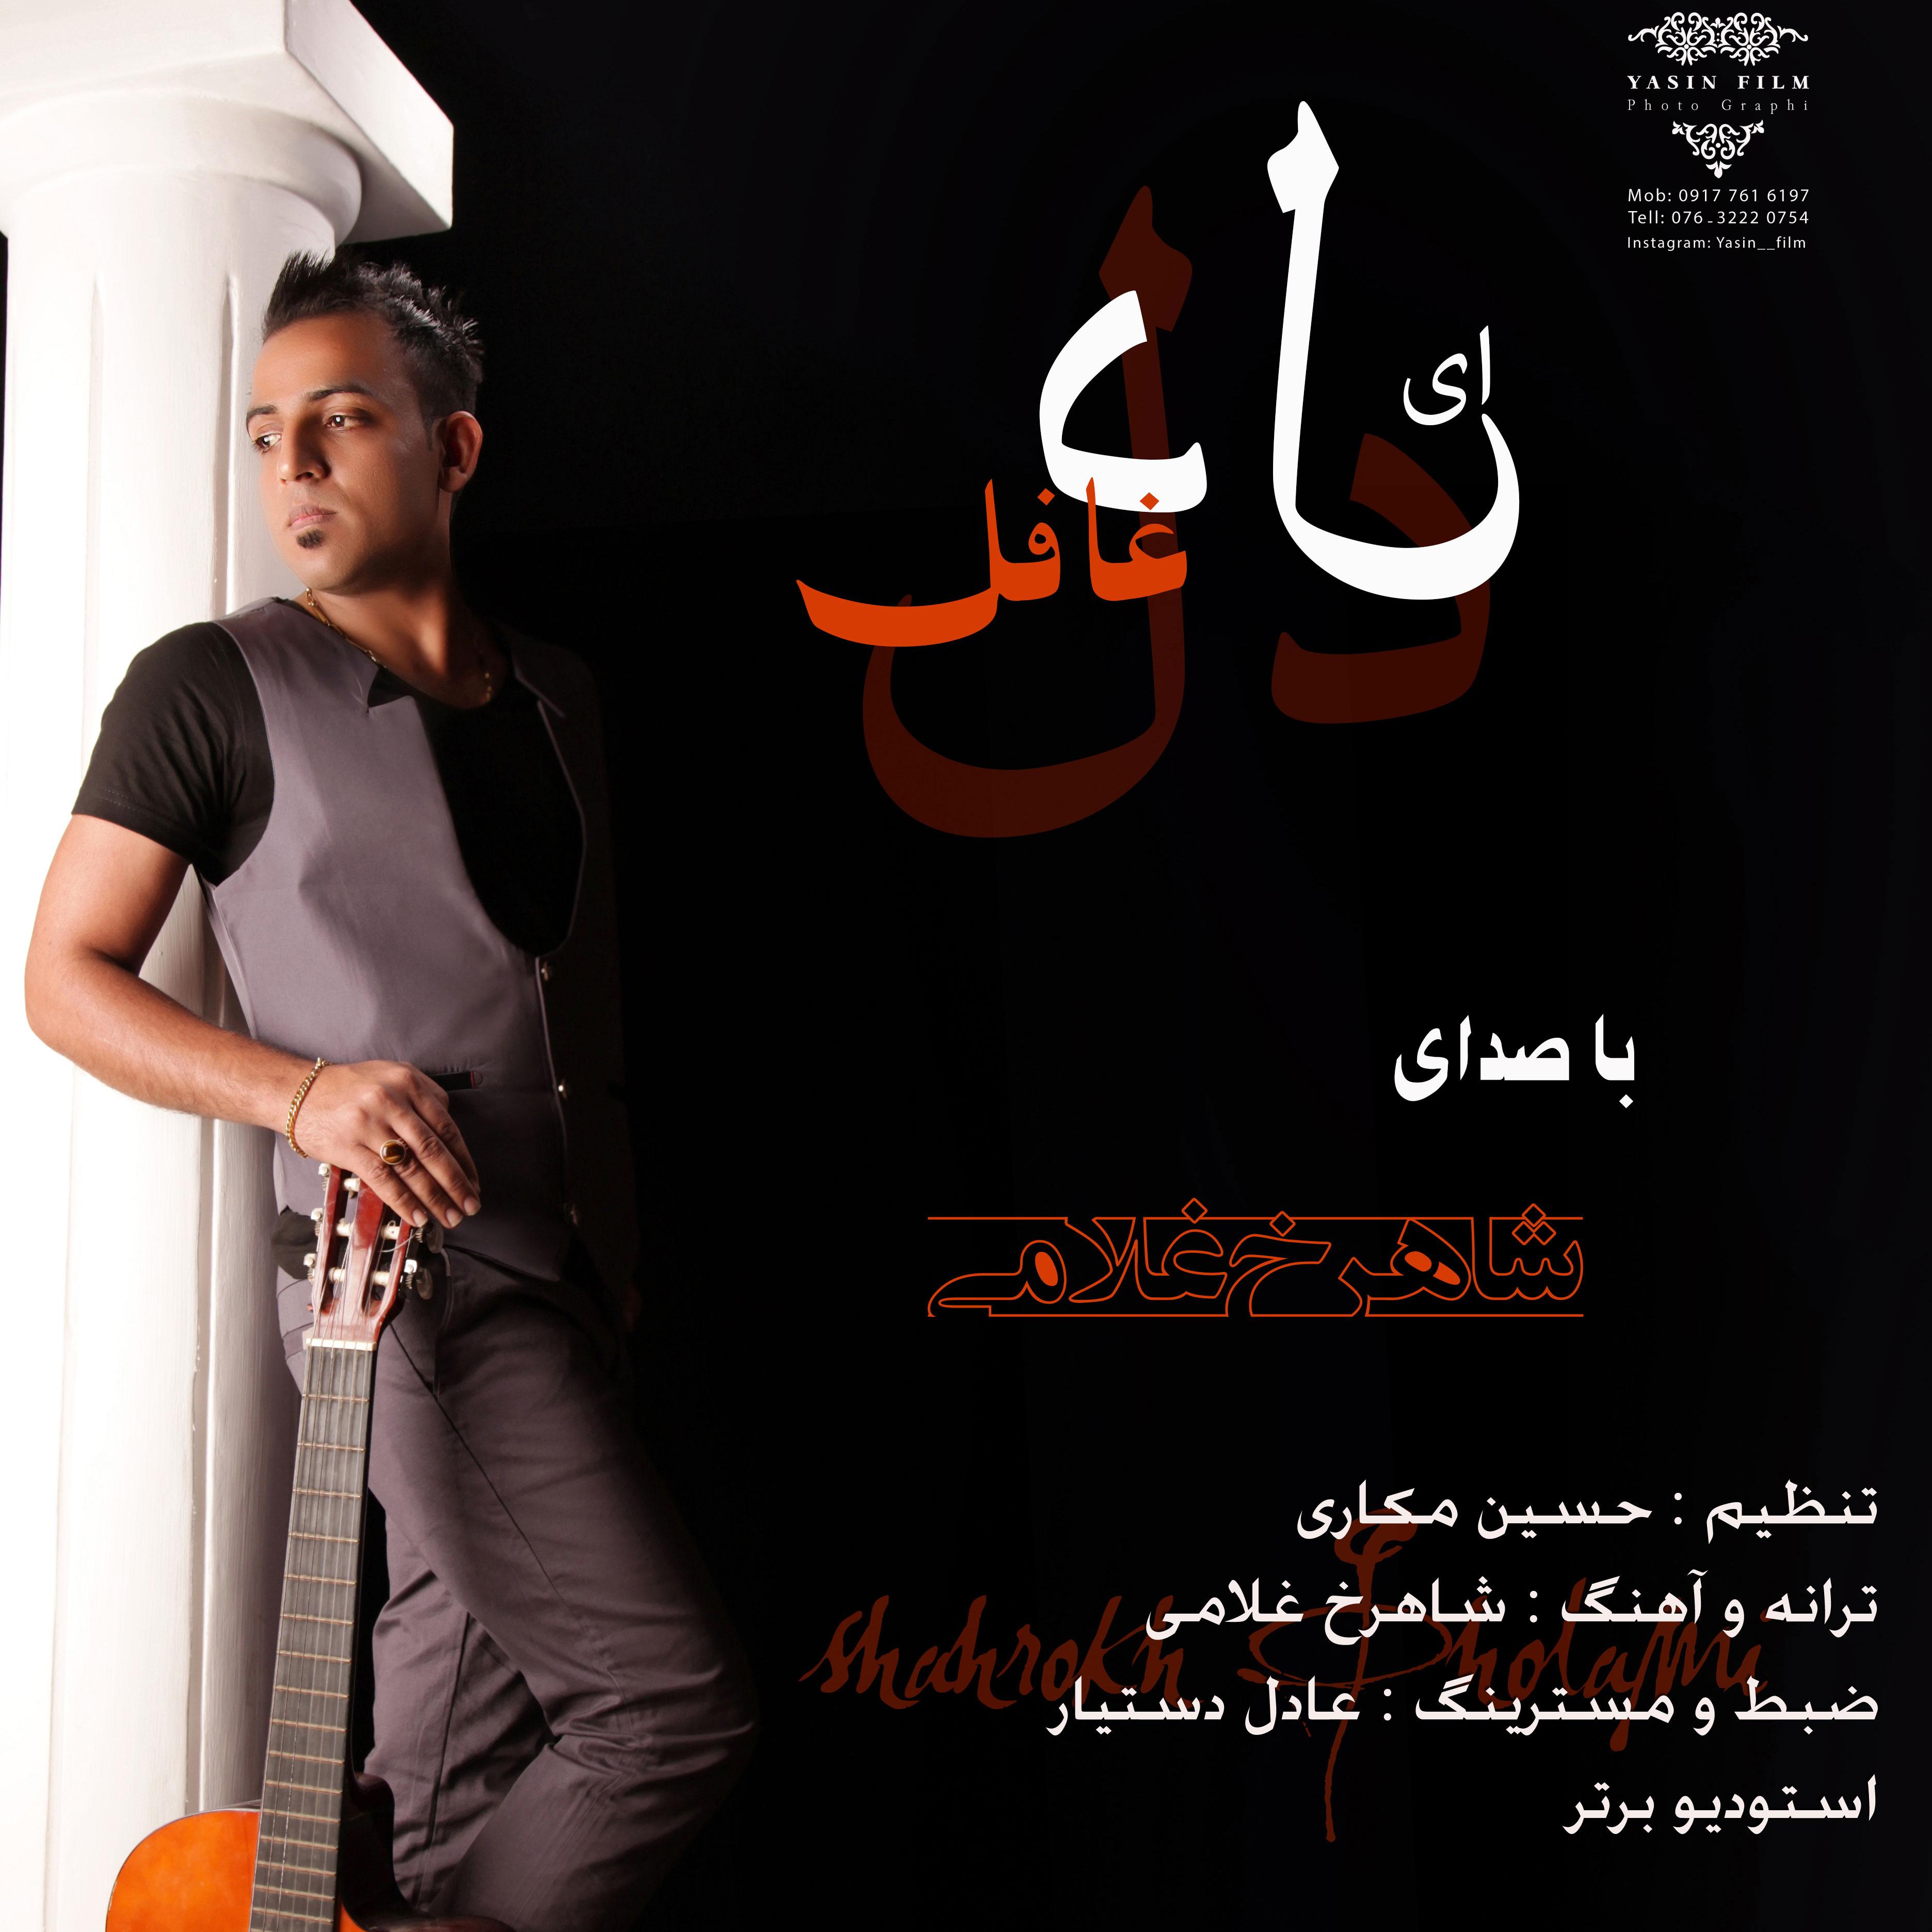 Shahrokh Qholami – Ey Dele Qhafel